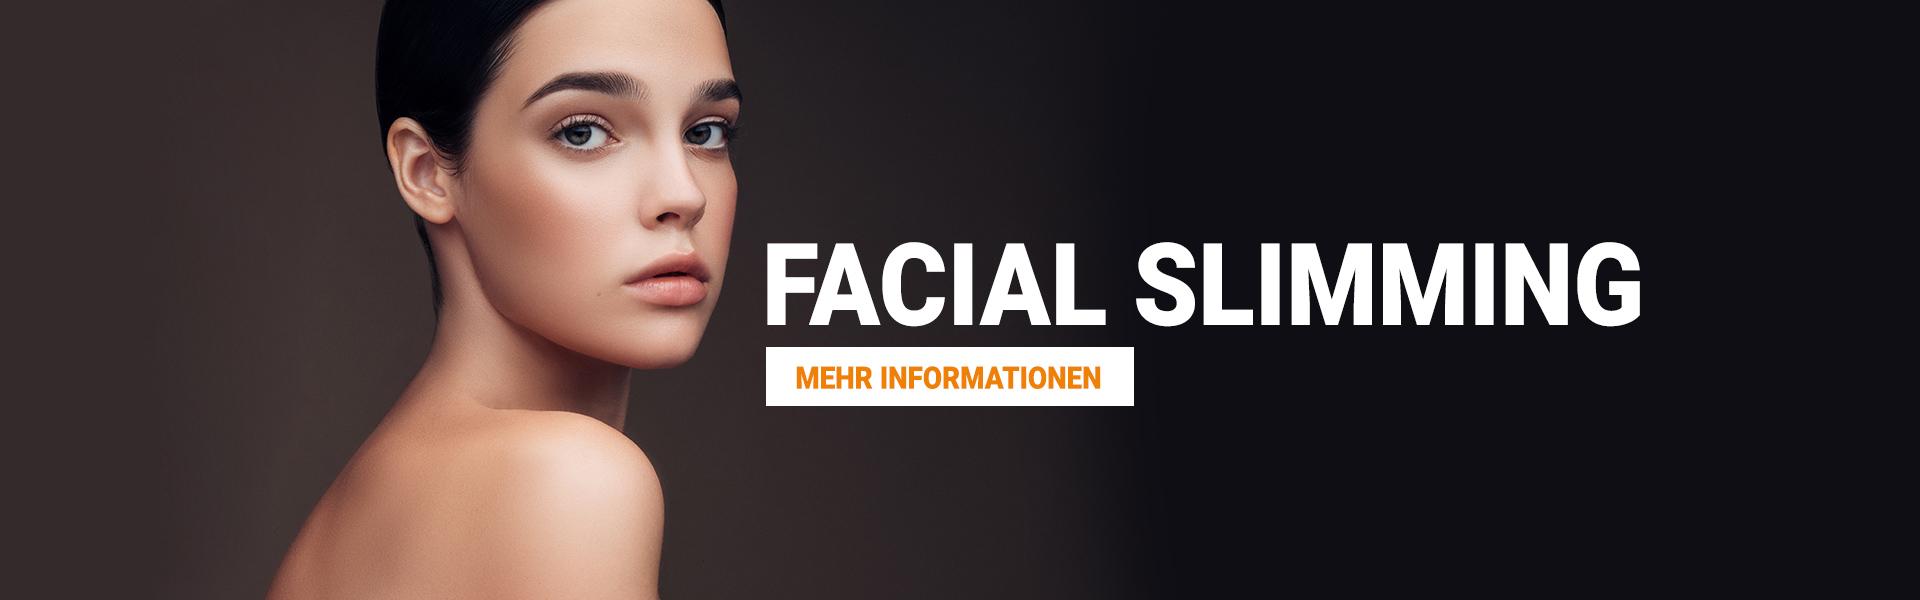 Facial Slimming - Mehr Informationen